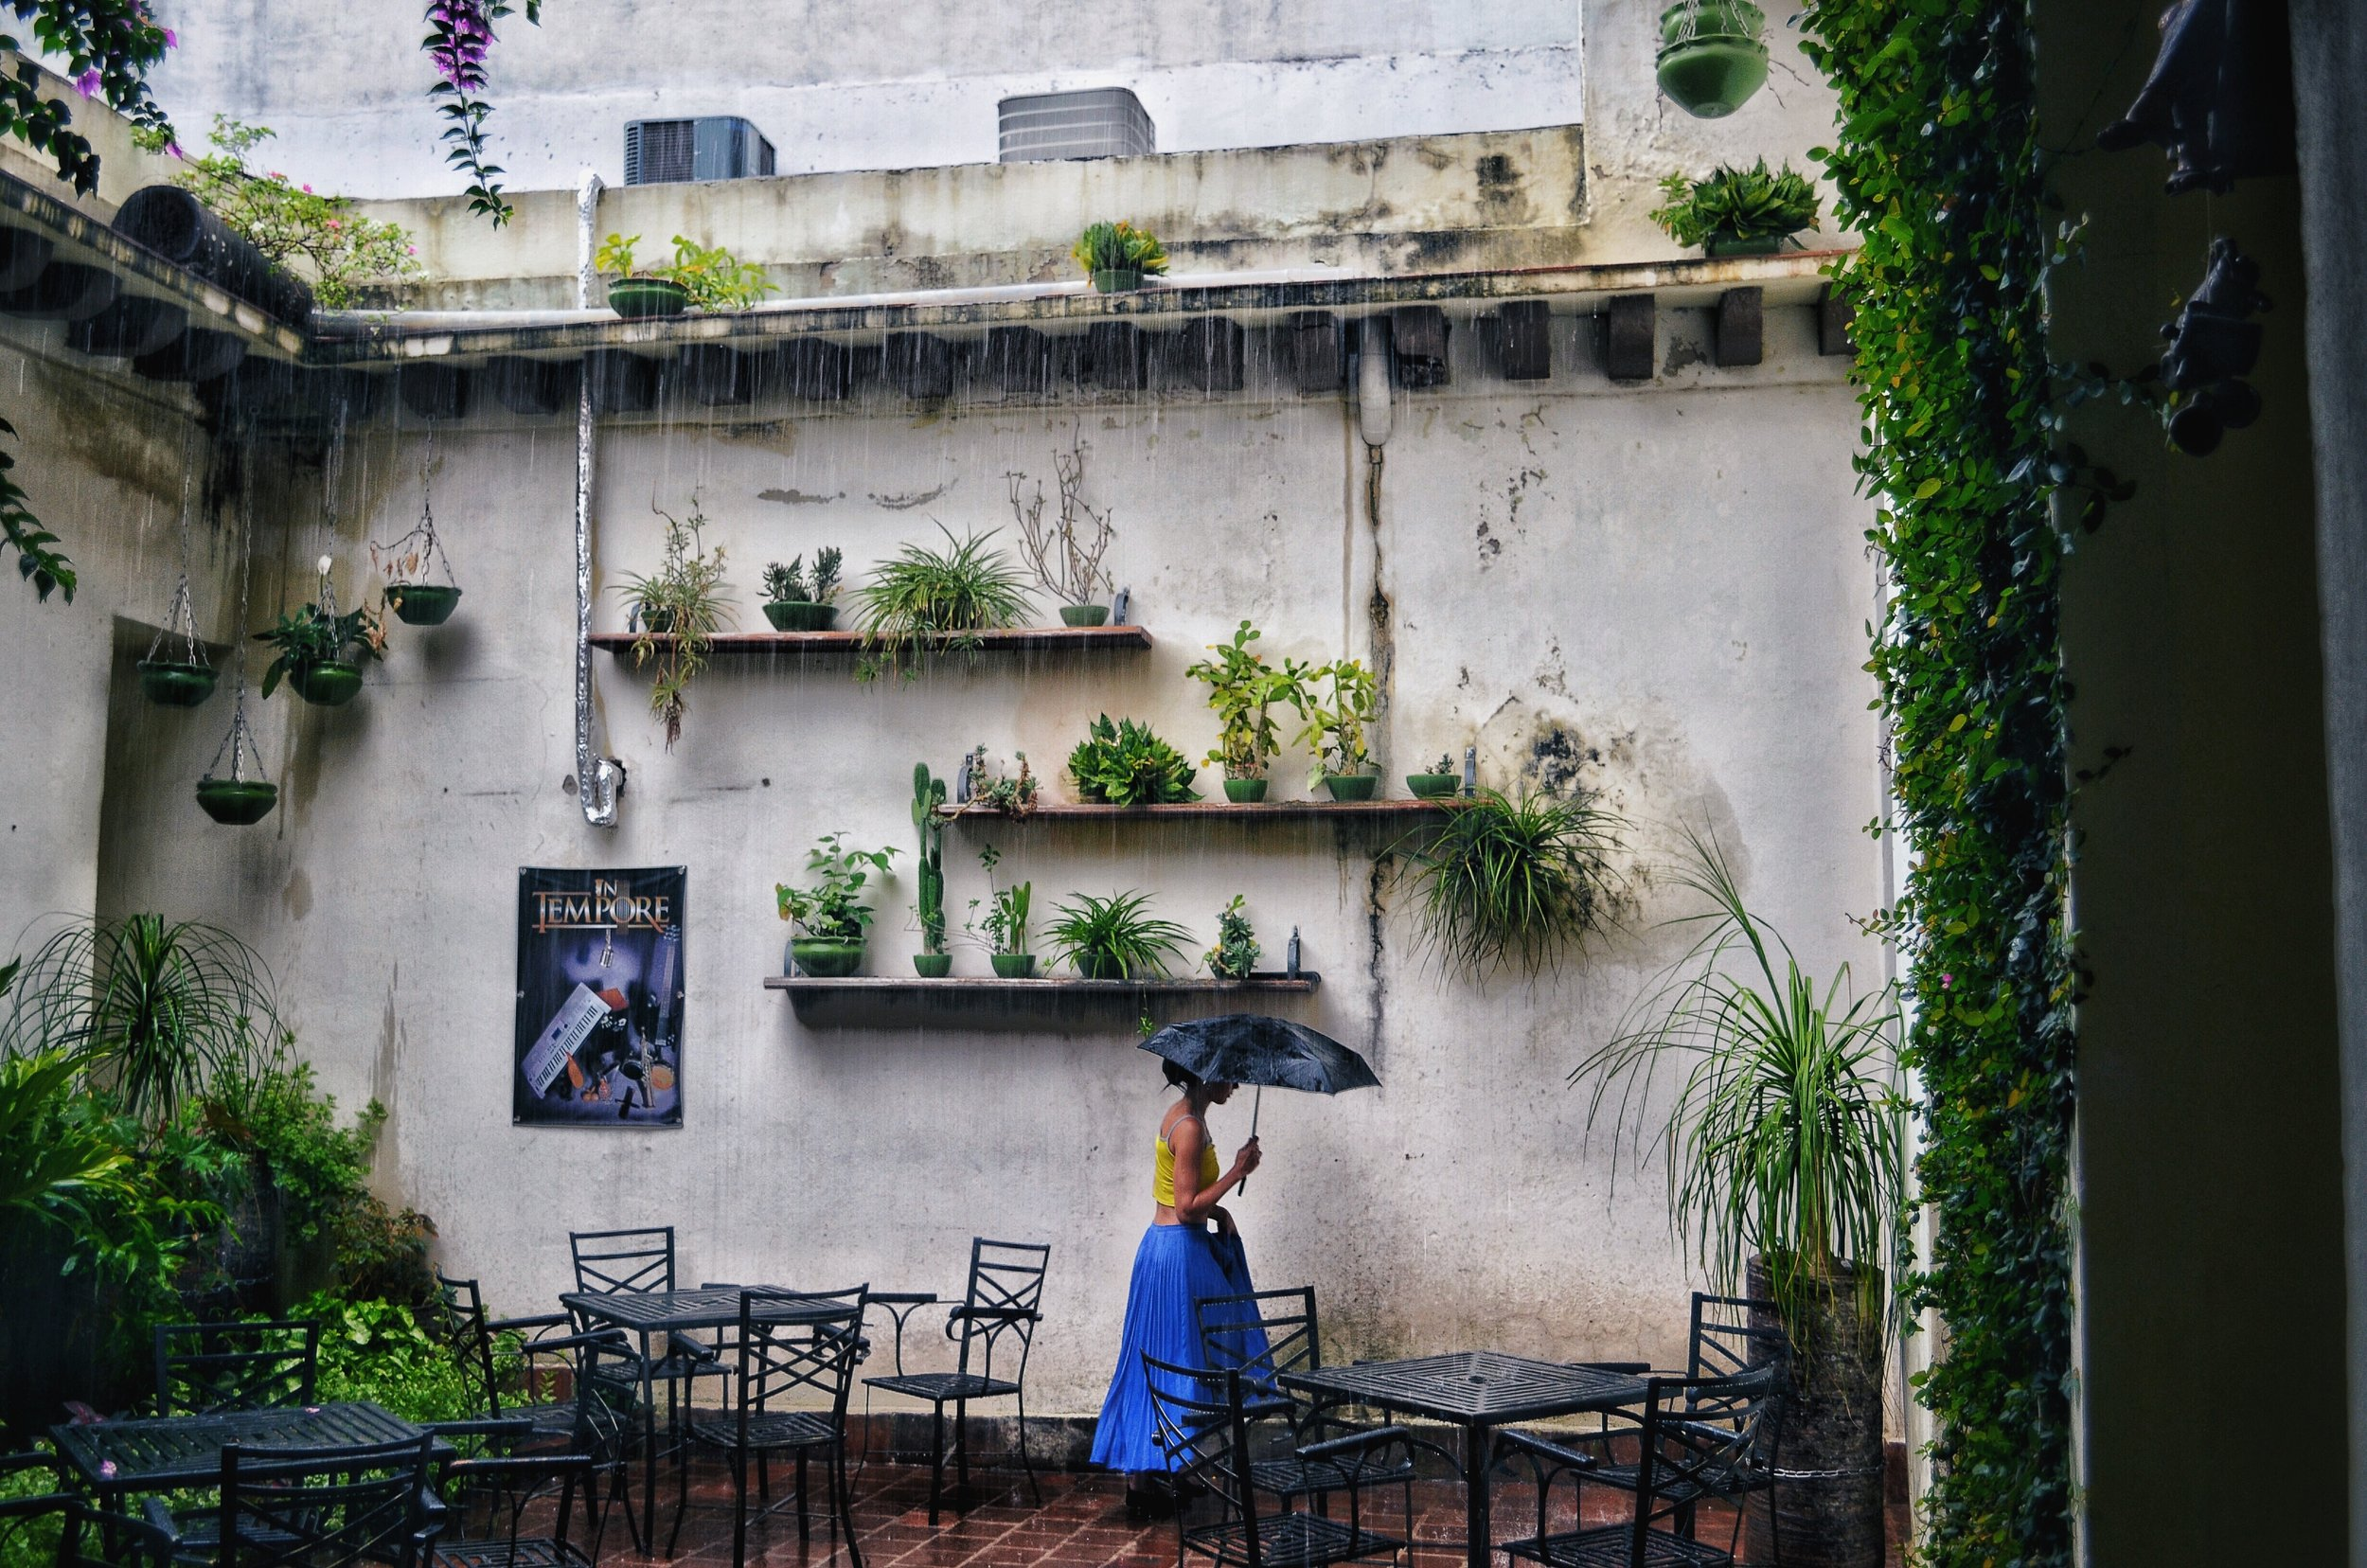 In the rain at Cafe Ciudad, Camaguey, Cuba